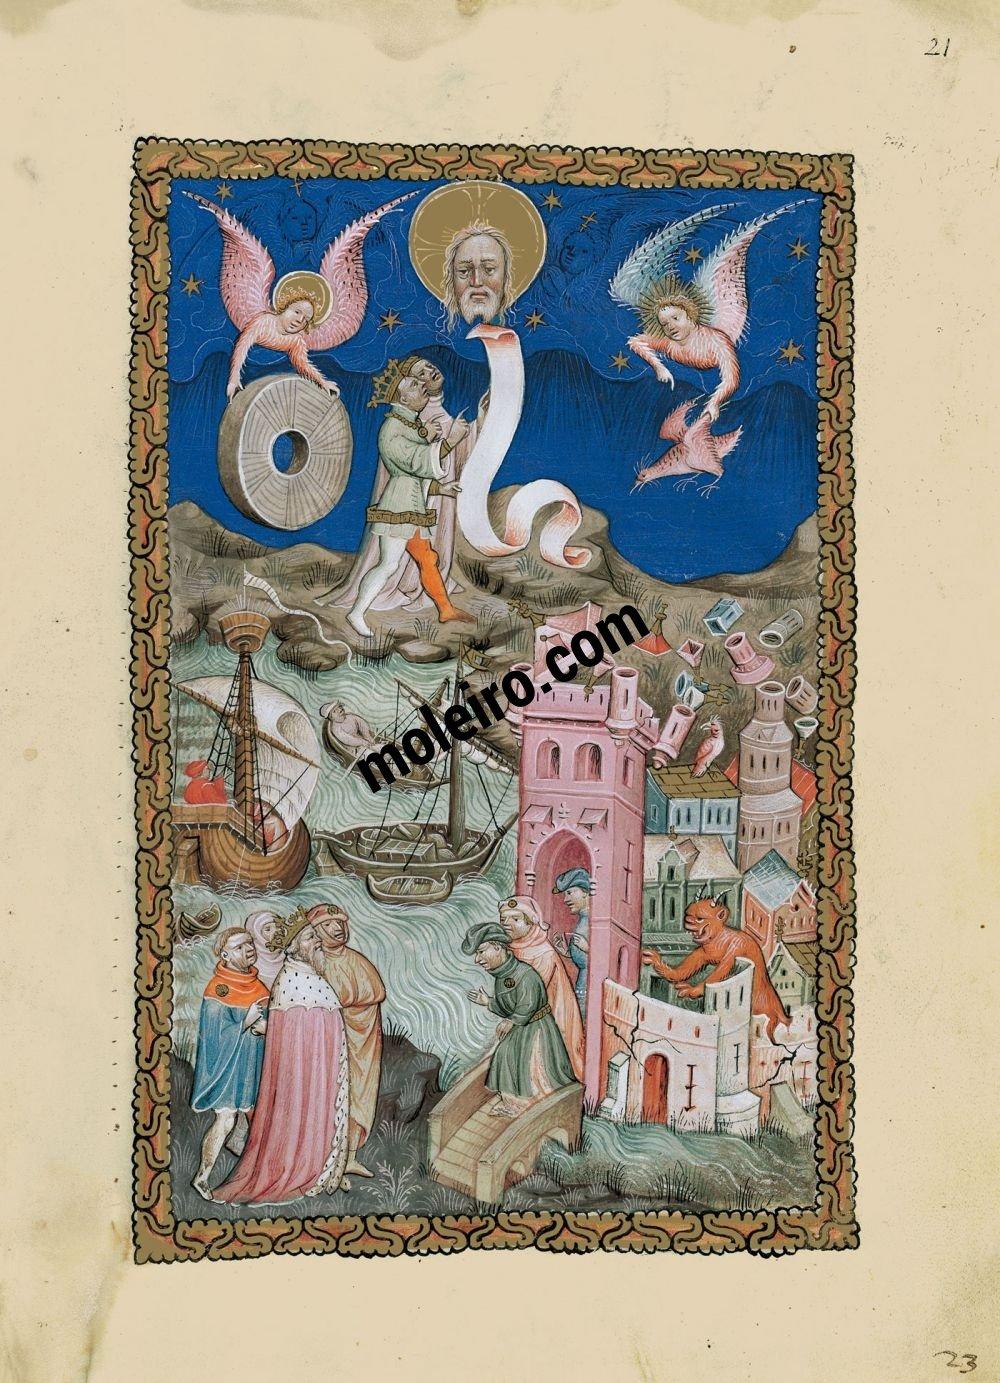 Apocalipsis Flamenco  f. 21r, La caída de Babilonia